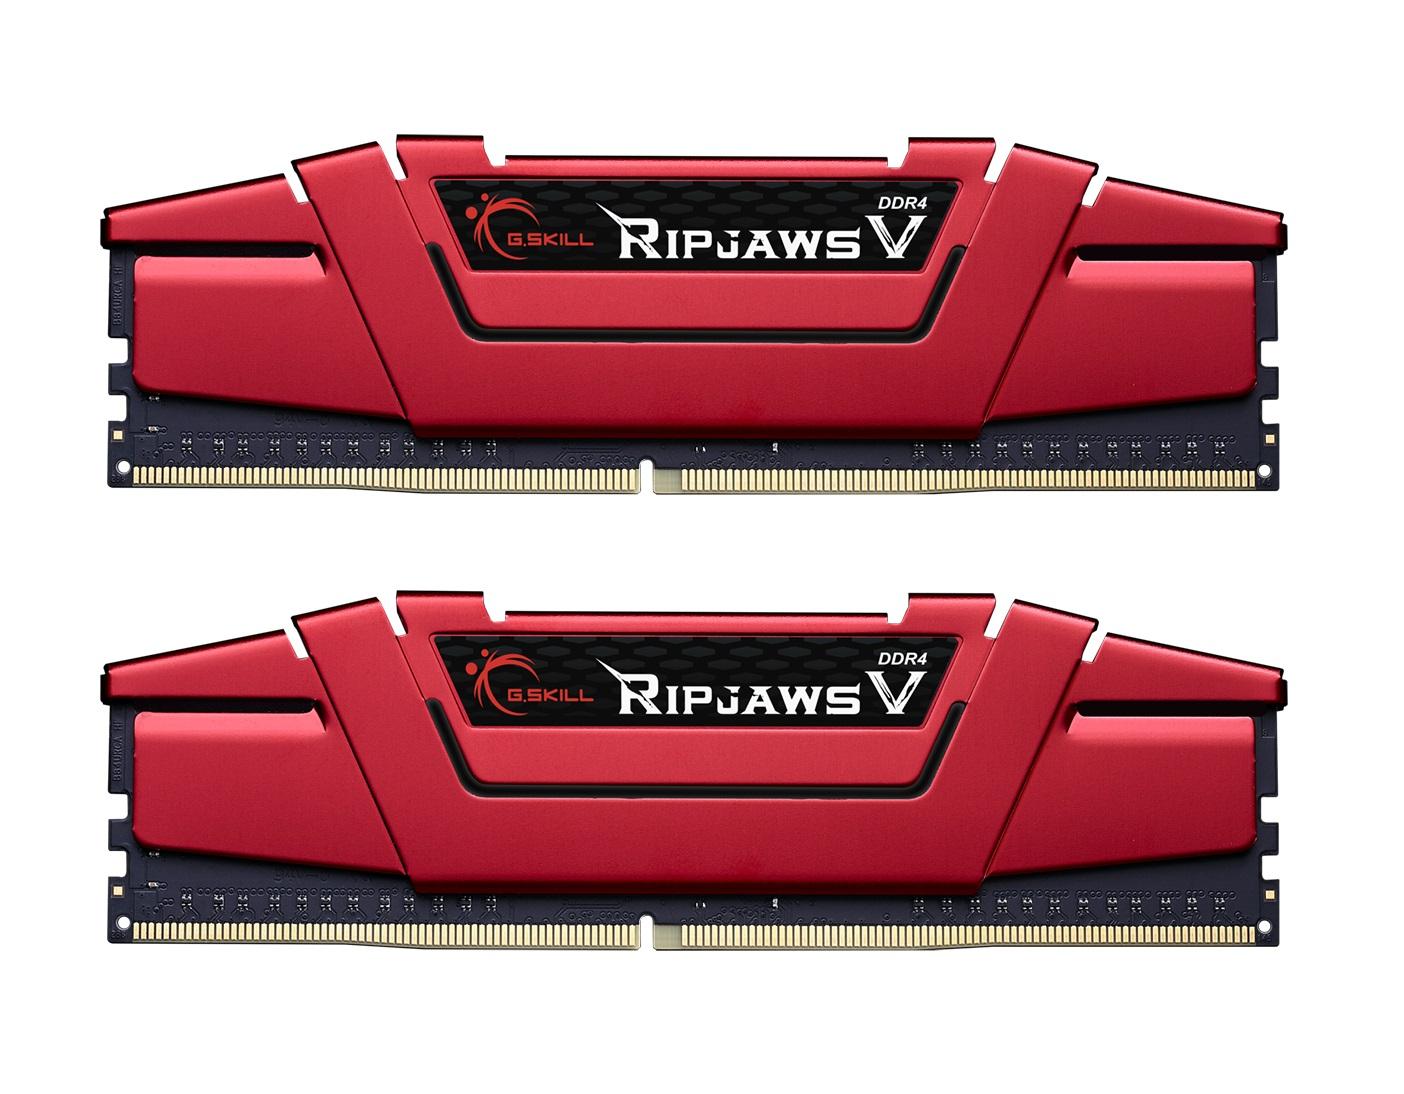 16GB G.Skill 3200MHz DDR4 SO-DIMM Laptop Kit CL16 1.20V PC4-25600 Ripjaws 2x8GB